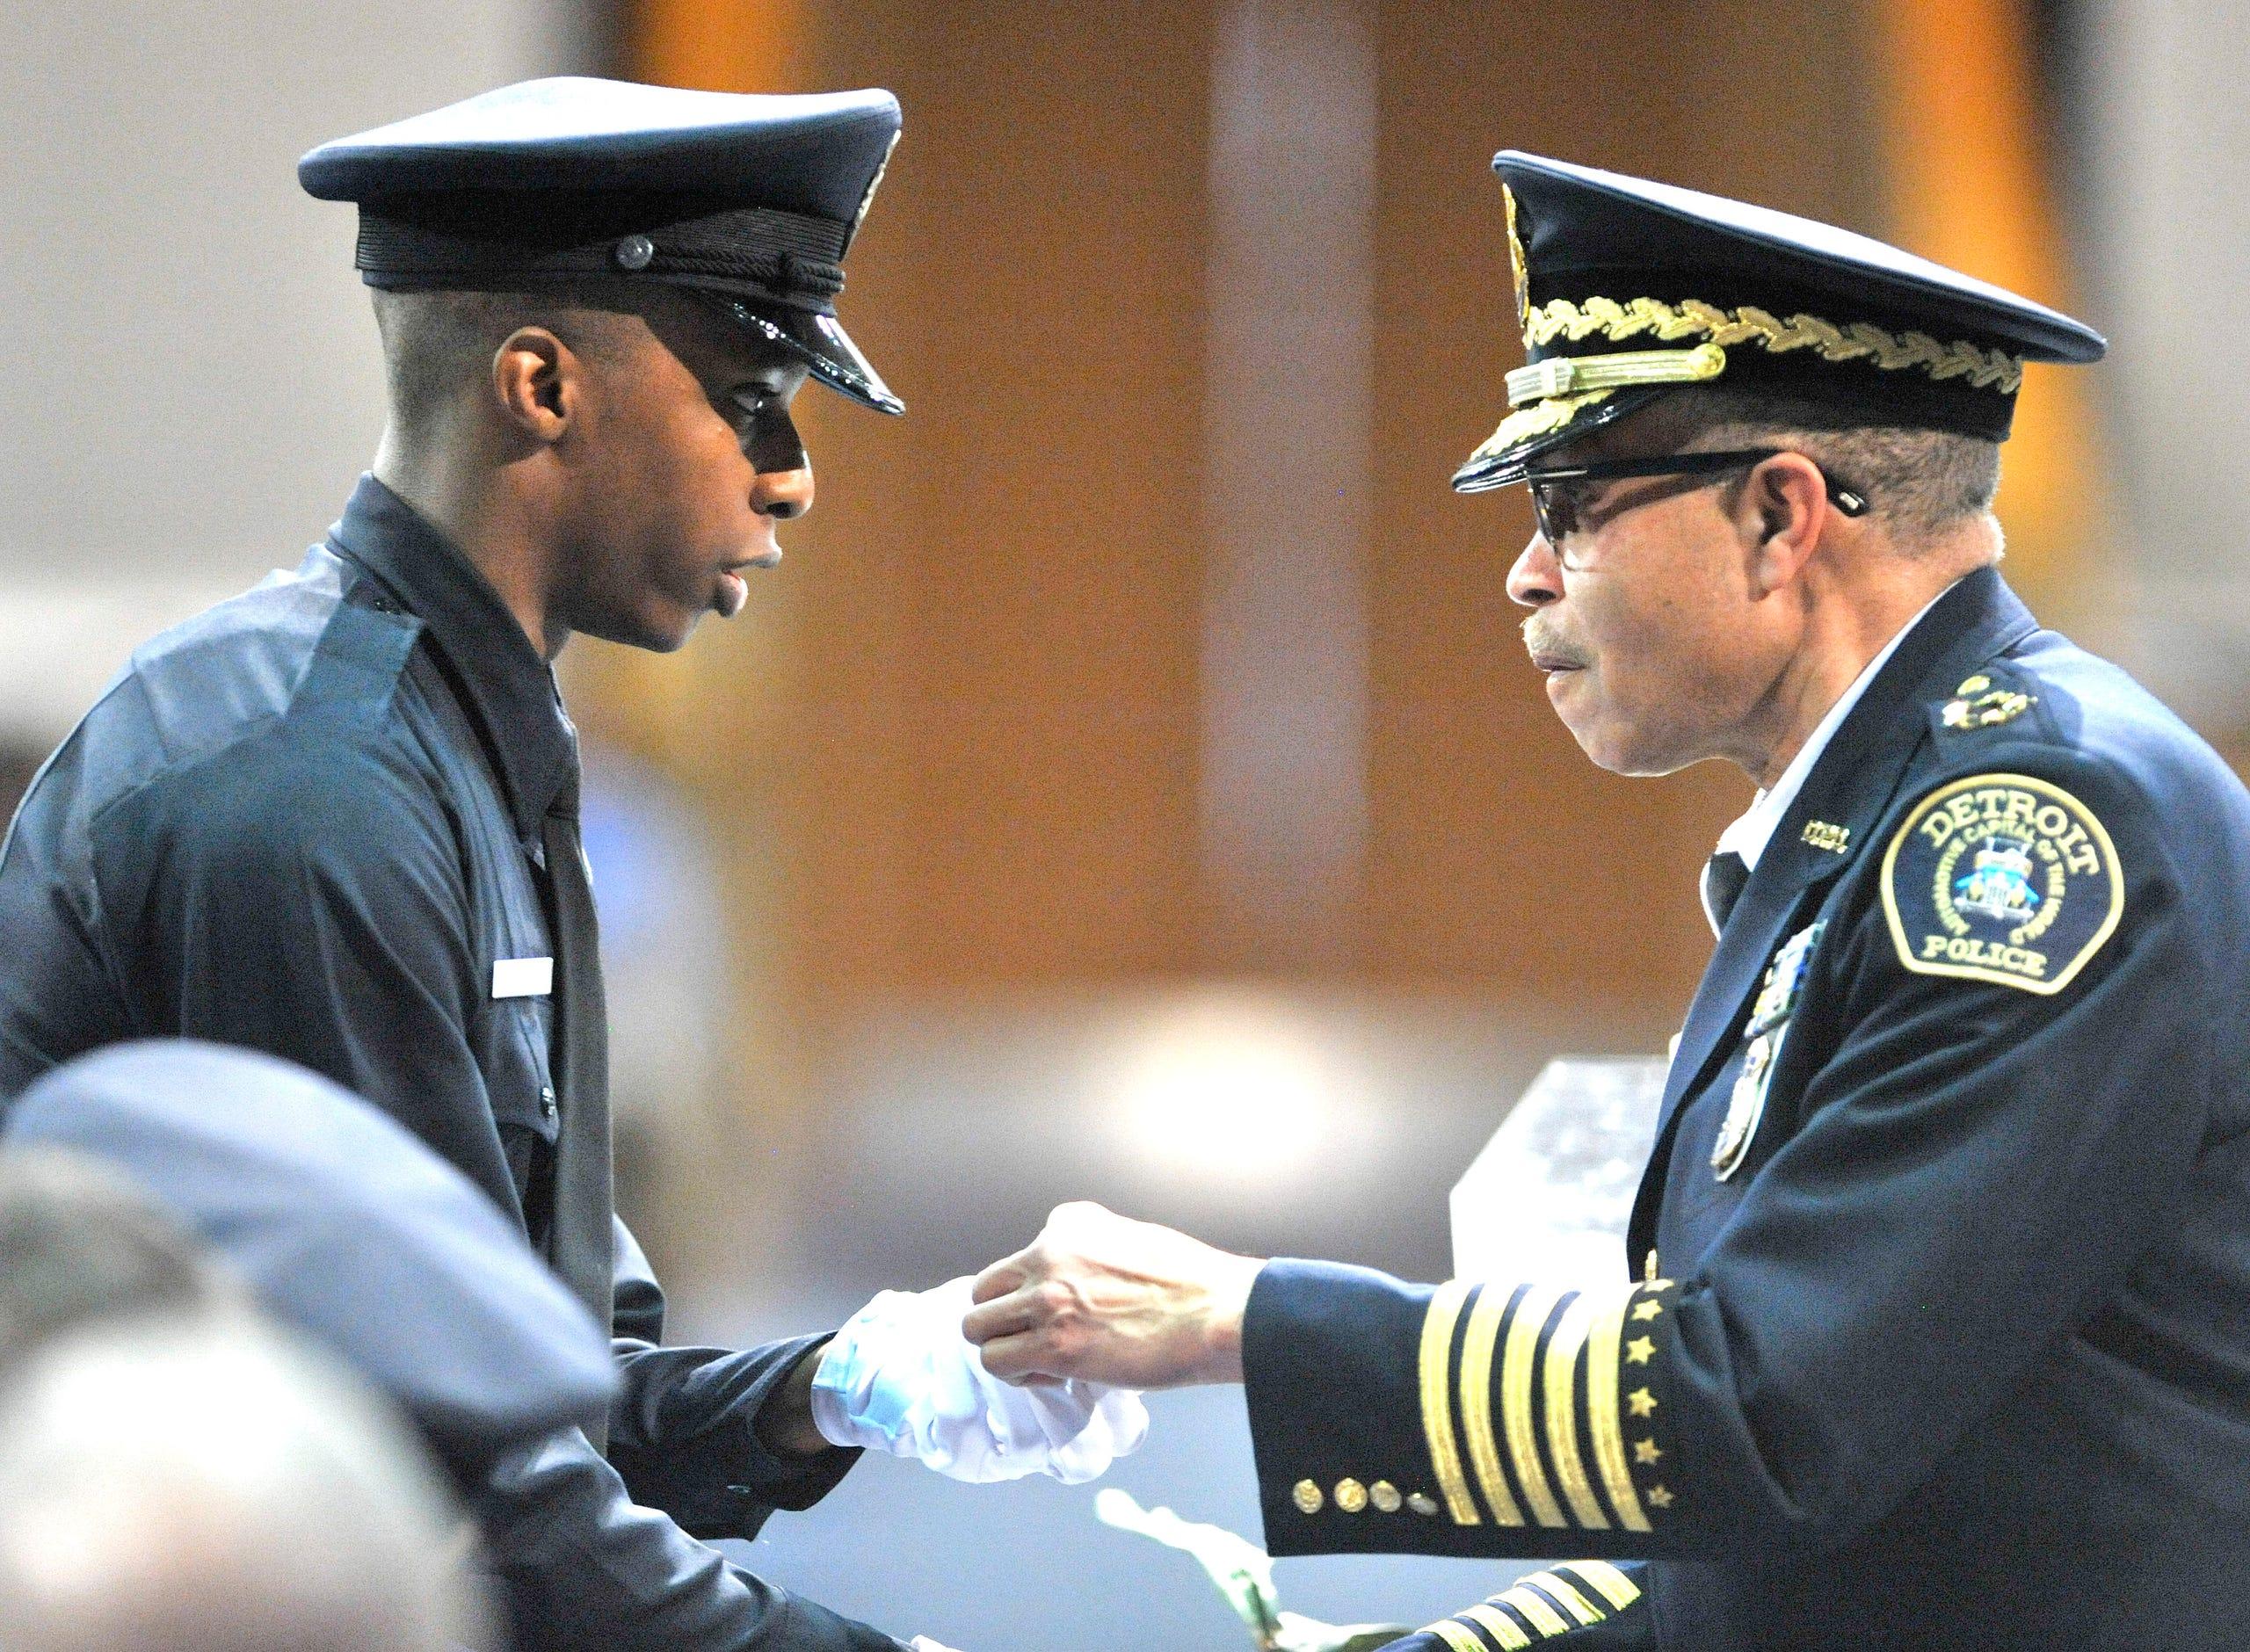 Detroit police academy graduation